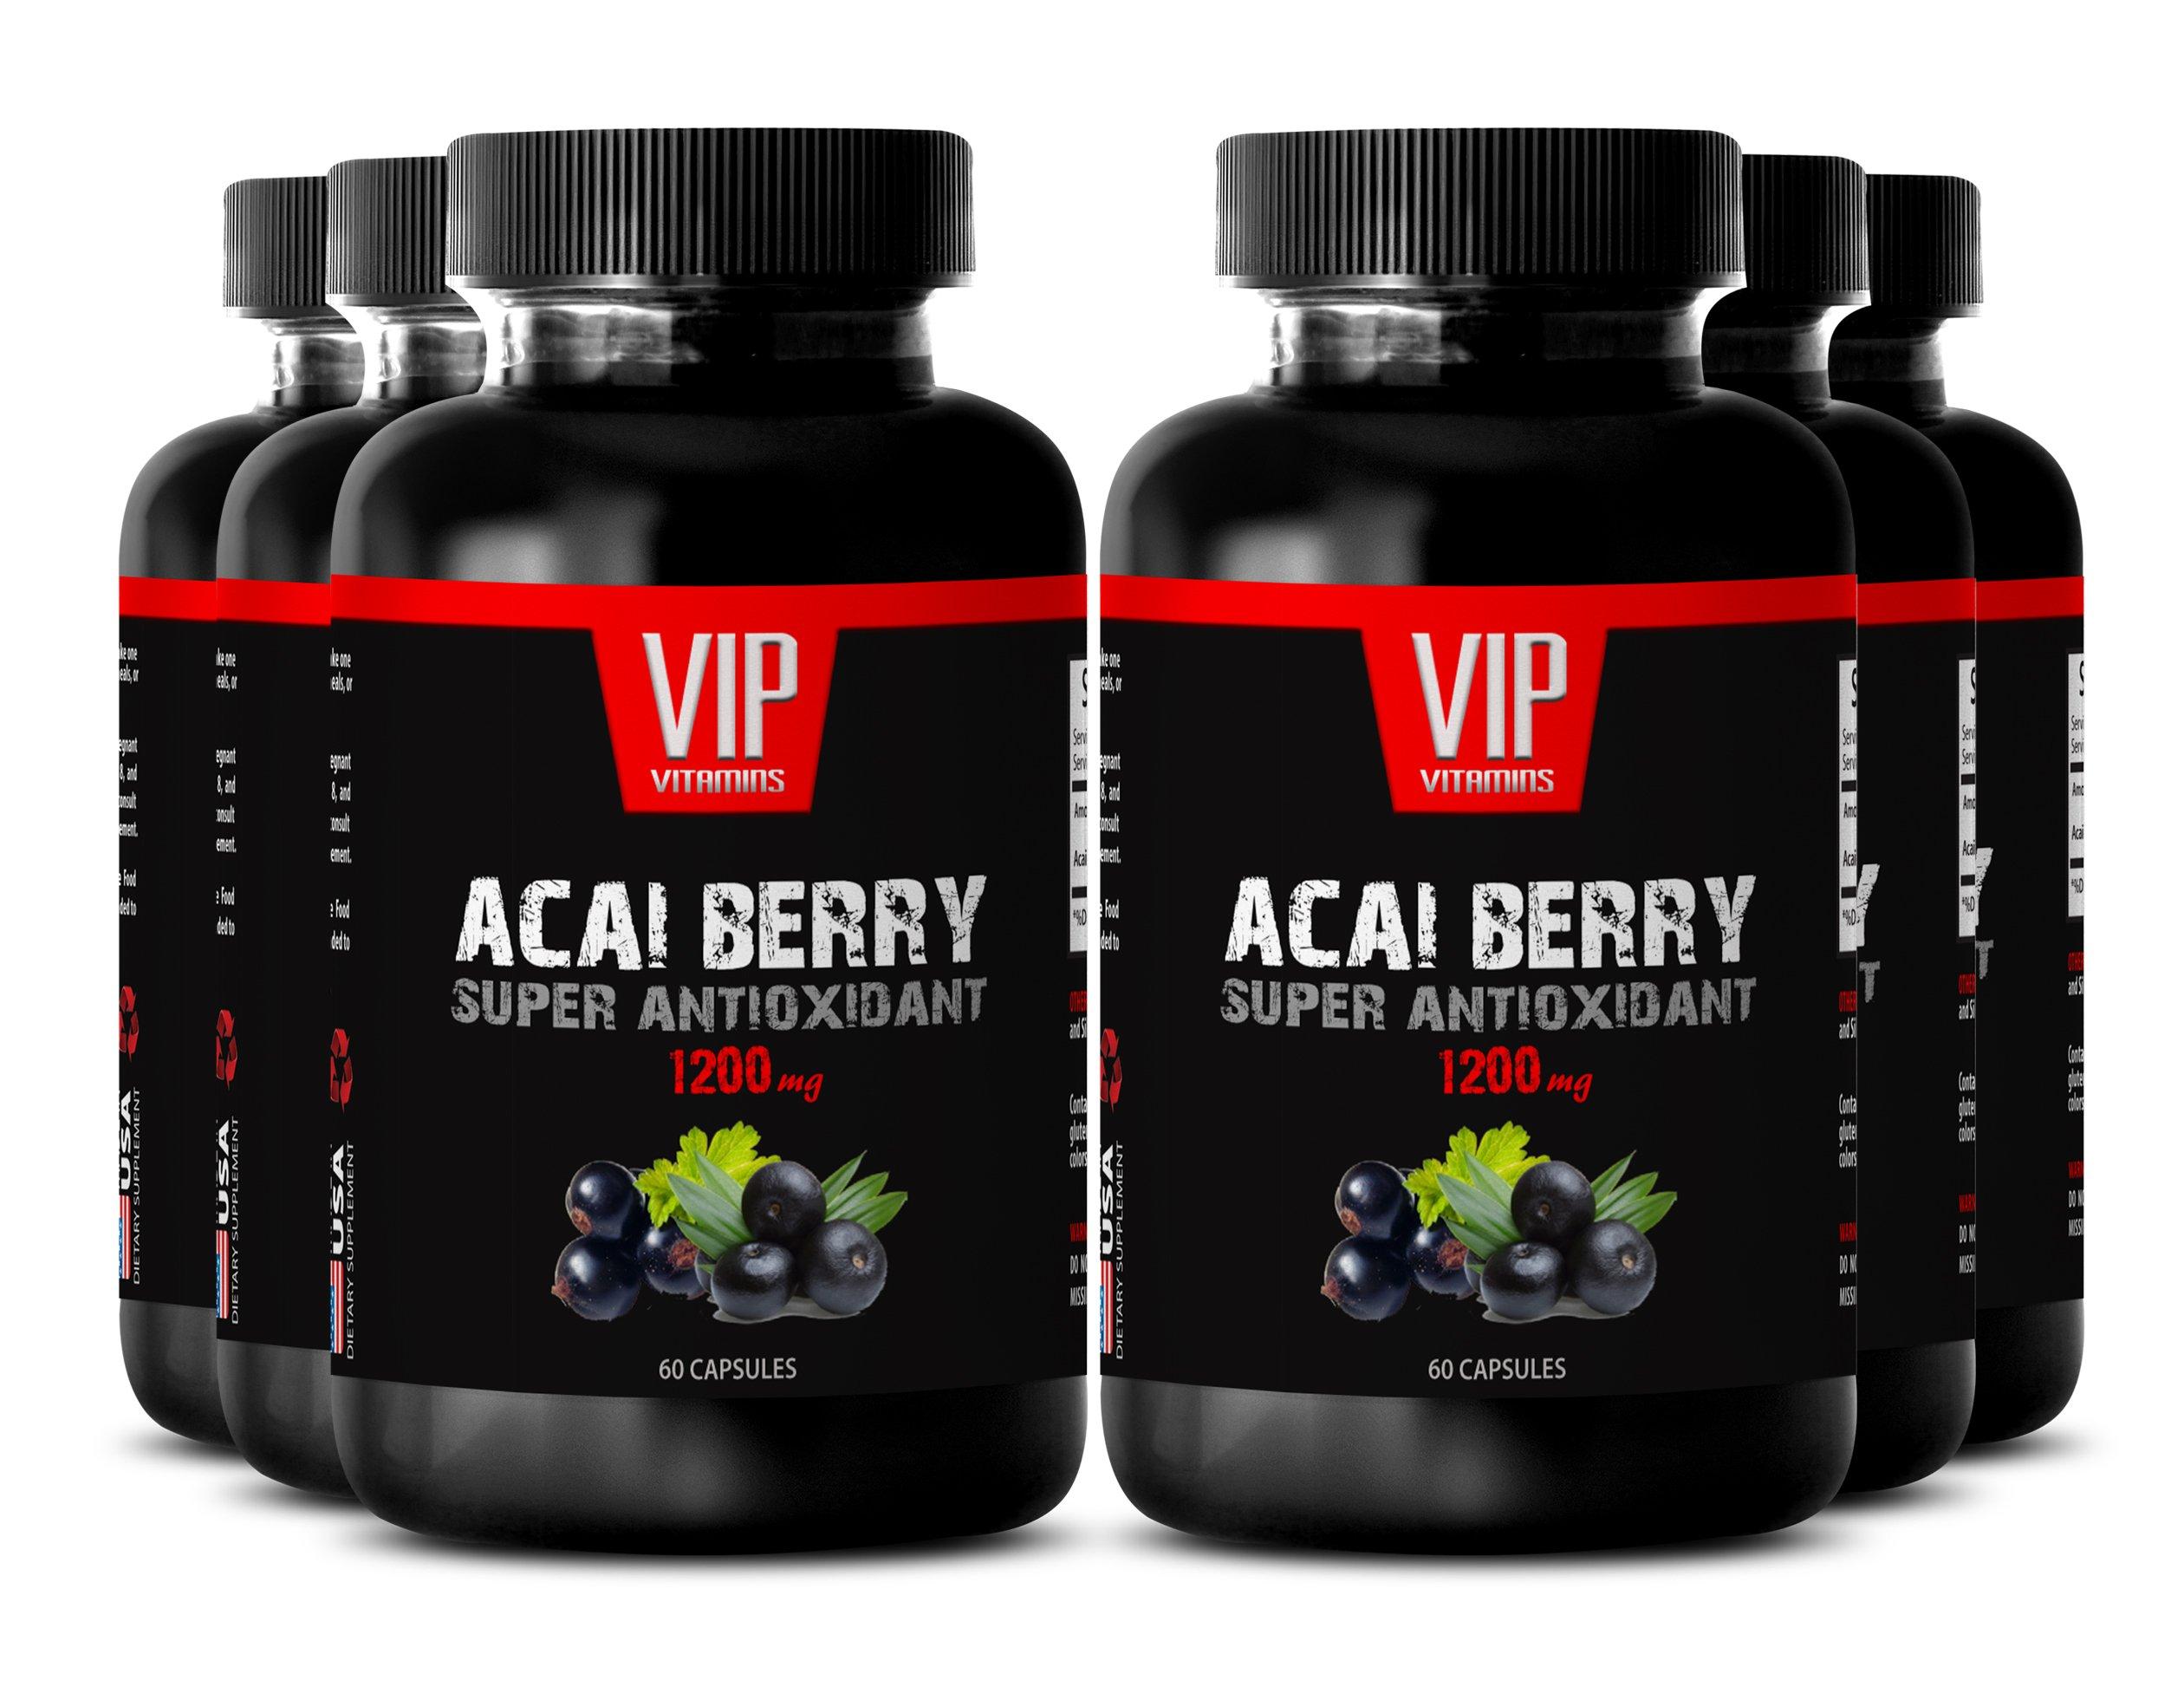 VIP VITAMINS Acai berry diet pills - ACAI BERRY SUPER ANTIOXIDANT EXTRACT 1200 MG - Antifungal candida - 6 Bottles 360 Capsules by VIP VITAMINS